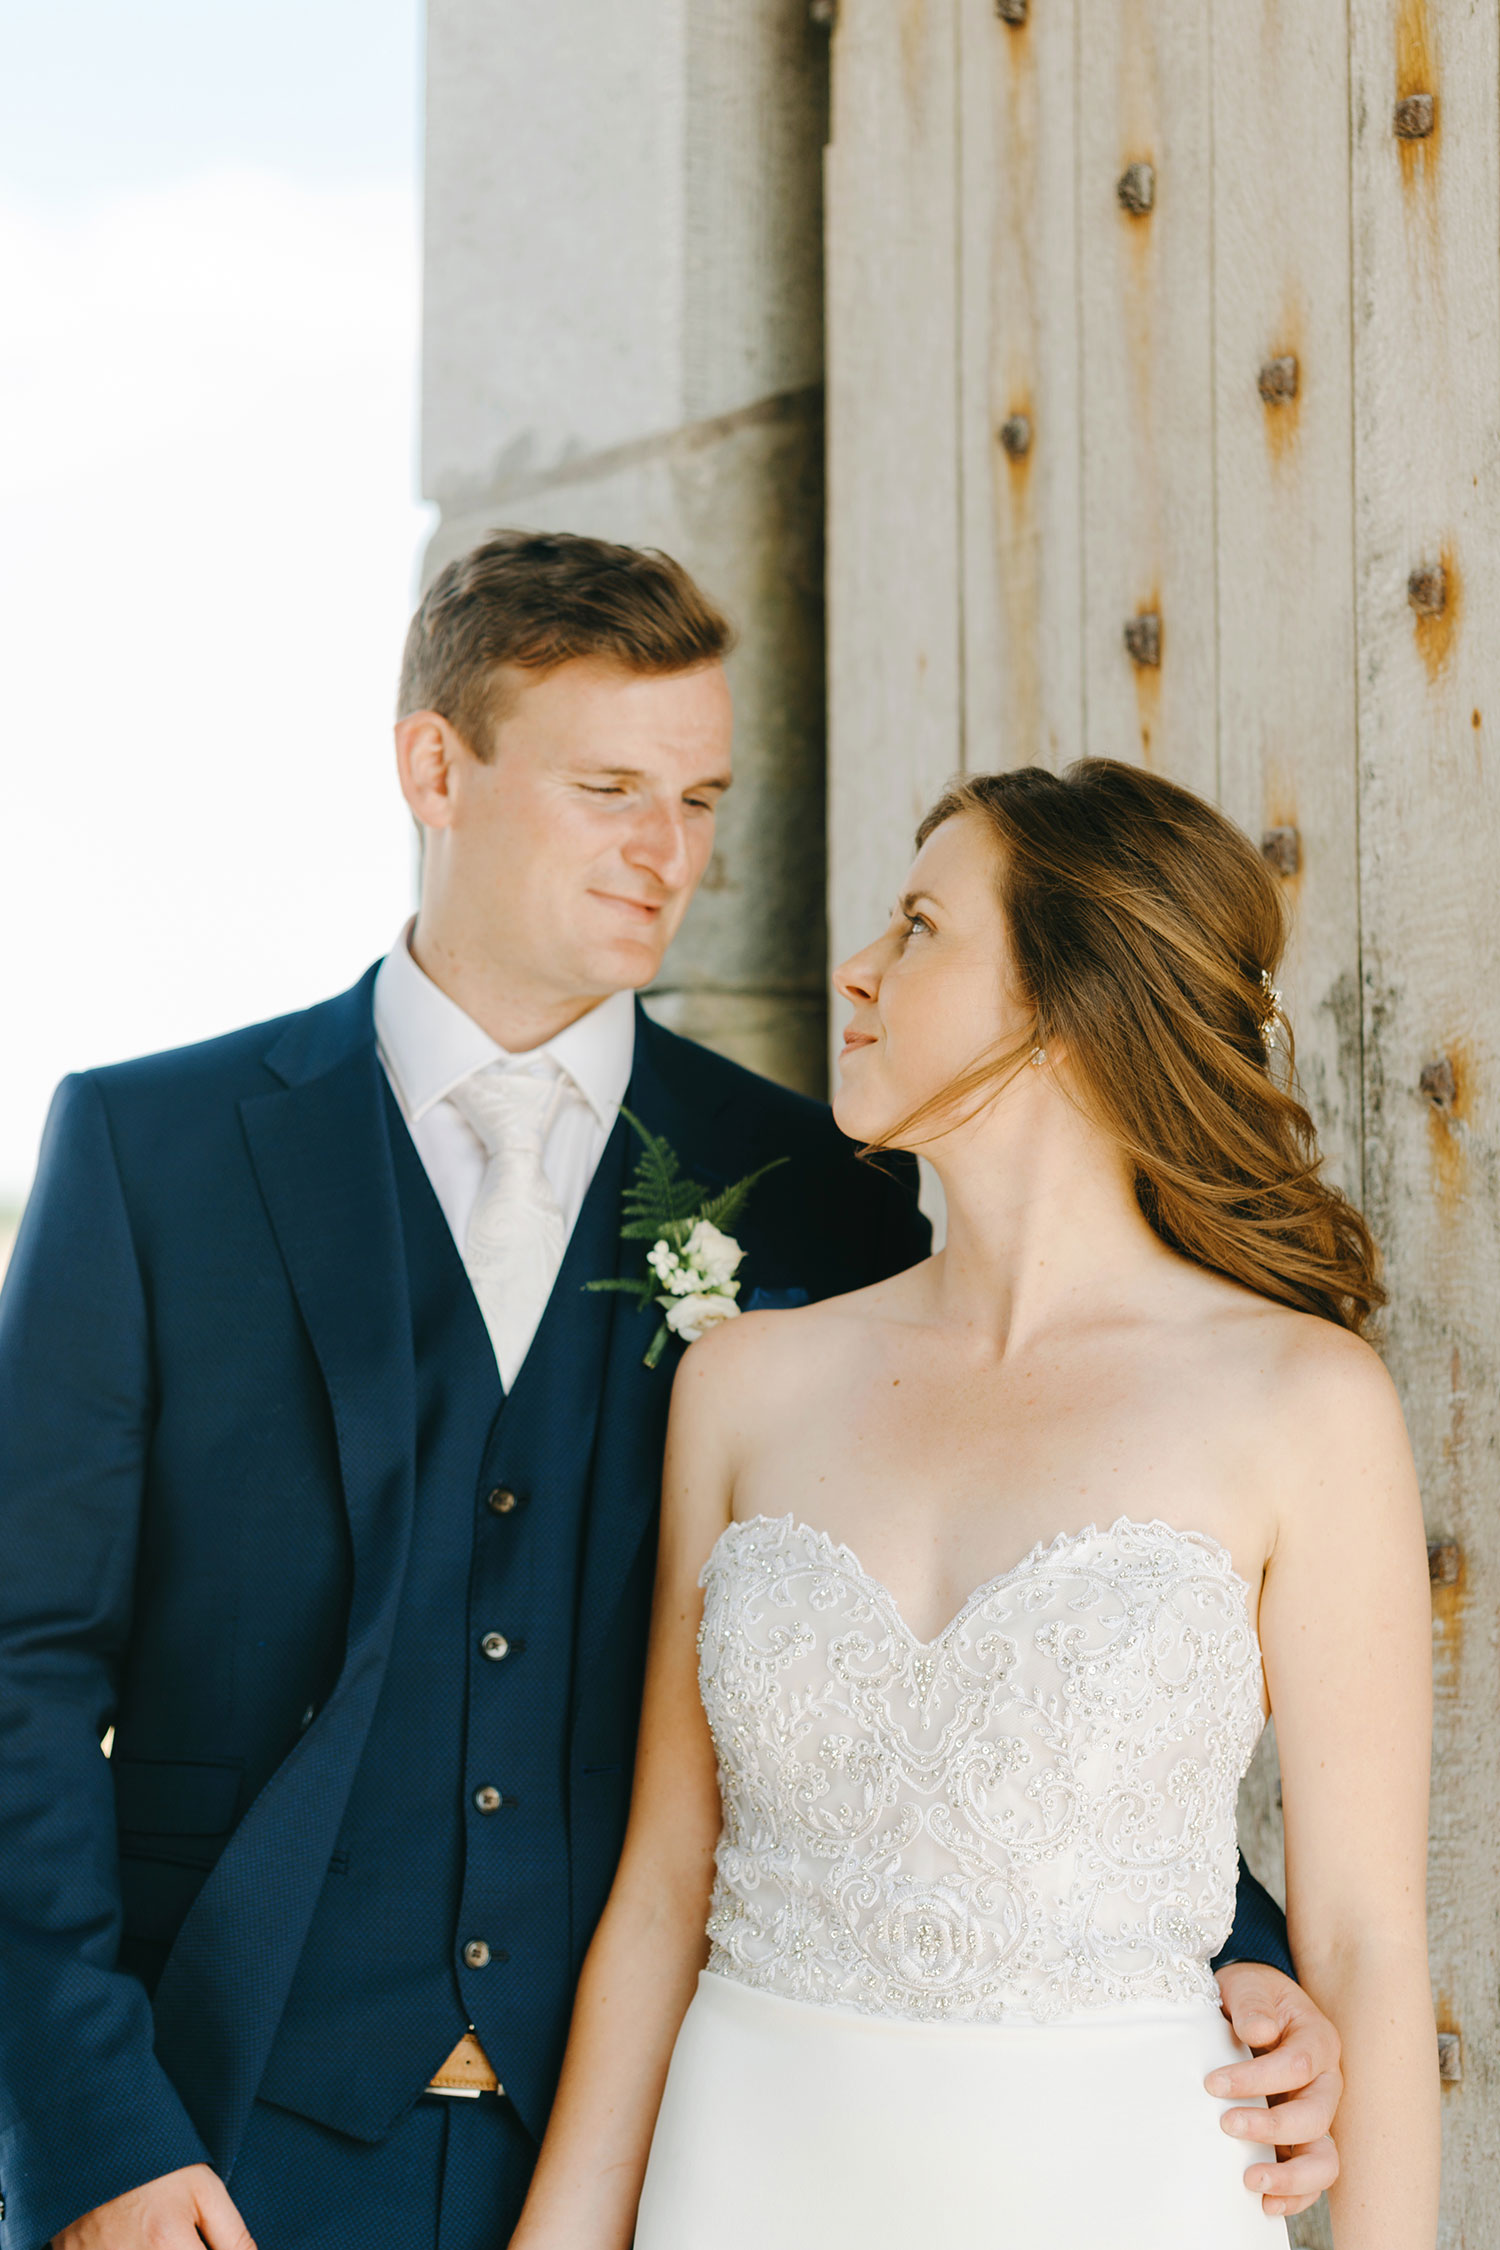 destination-wedding-photographer-ballinacurra-house-wedding-20180711_0041.jpg